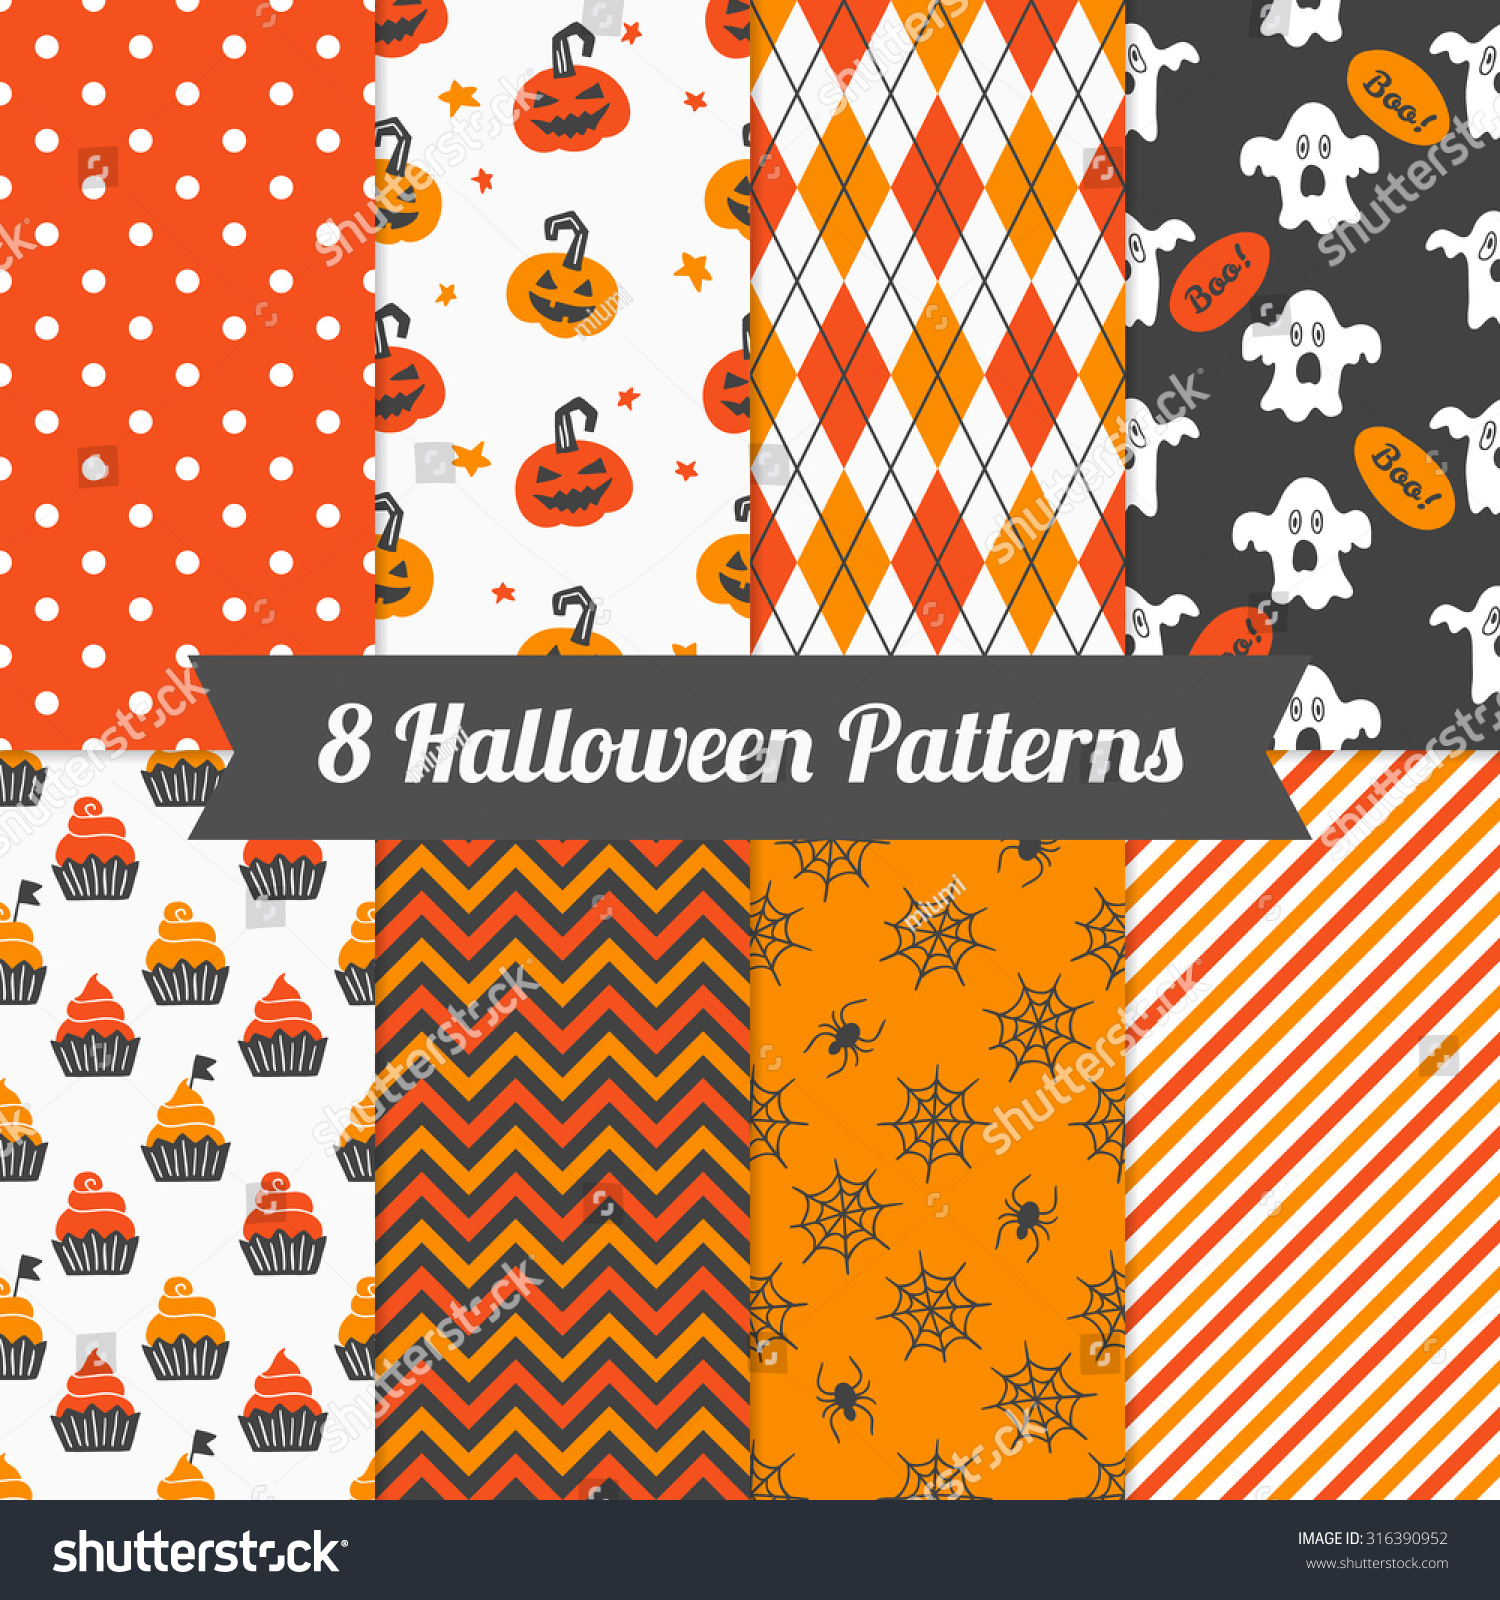 Wonderful Wallpaper Halloween Polka Dot - stock-vector-set-of-halloween-patterns-with-cupcakes-pumpkins-spiders-ghosts-polka-dot-chevron-argyle-and-316390952  HD_2110078.jpg